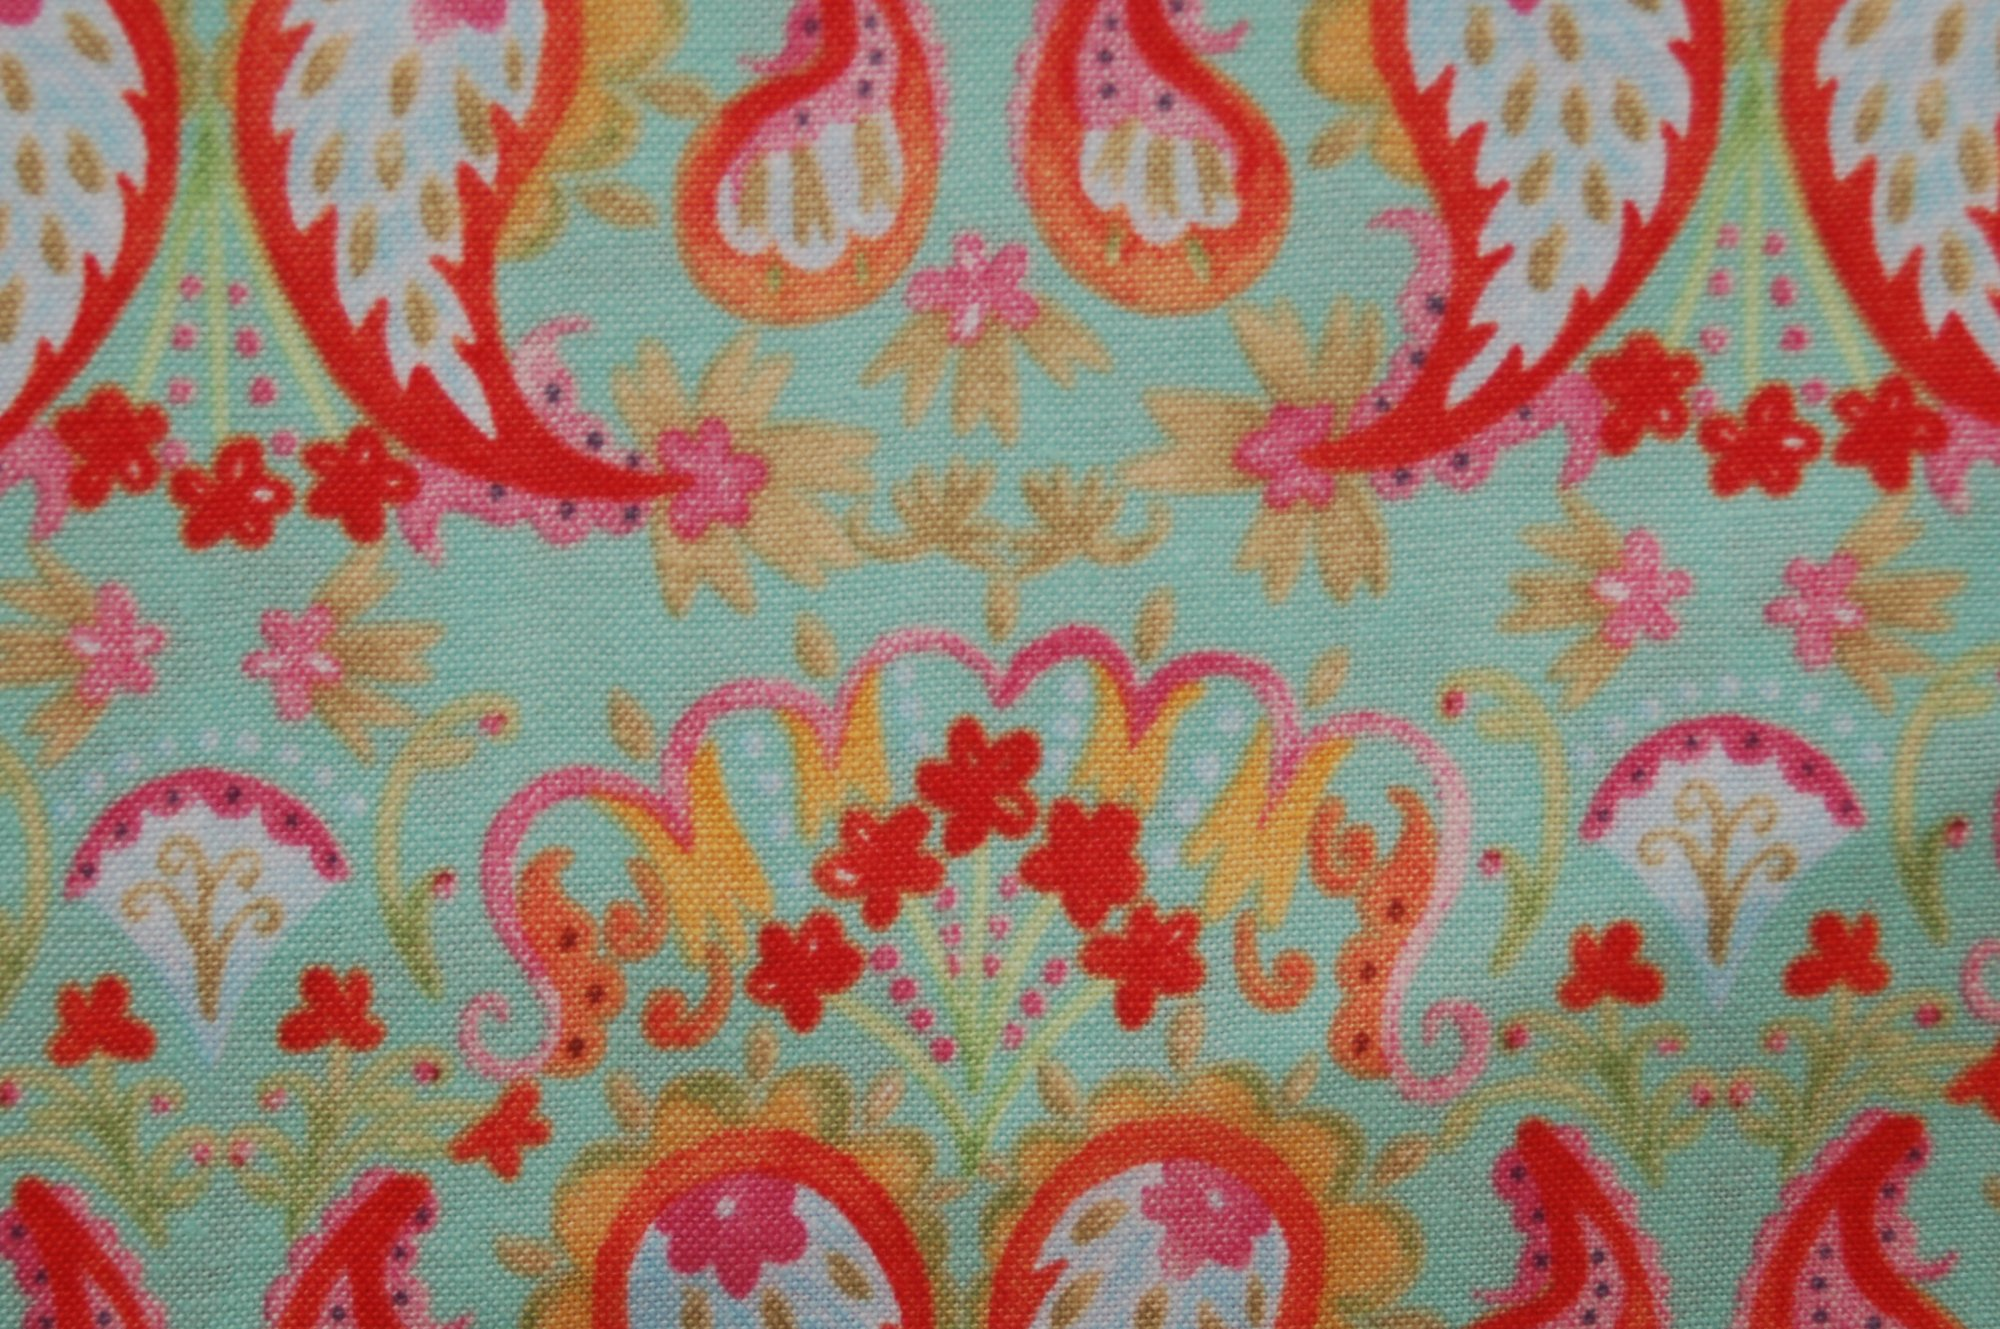 Seasons - Paisley Love from Anna Davis for Blend Fabrics